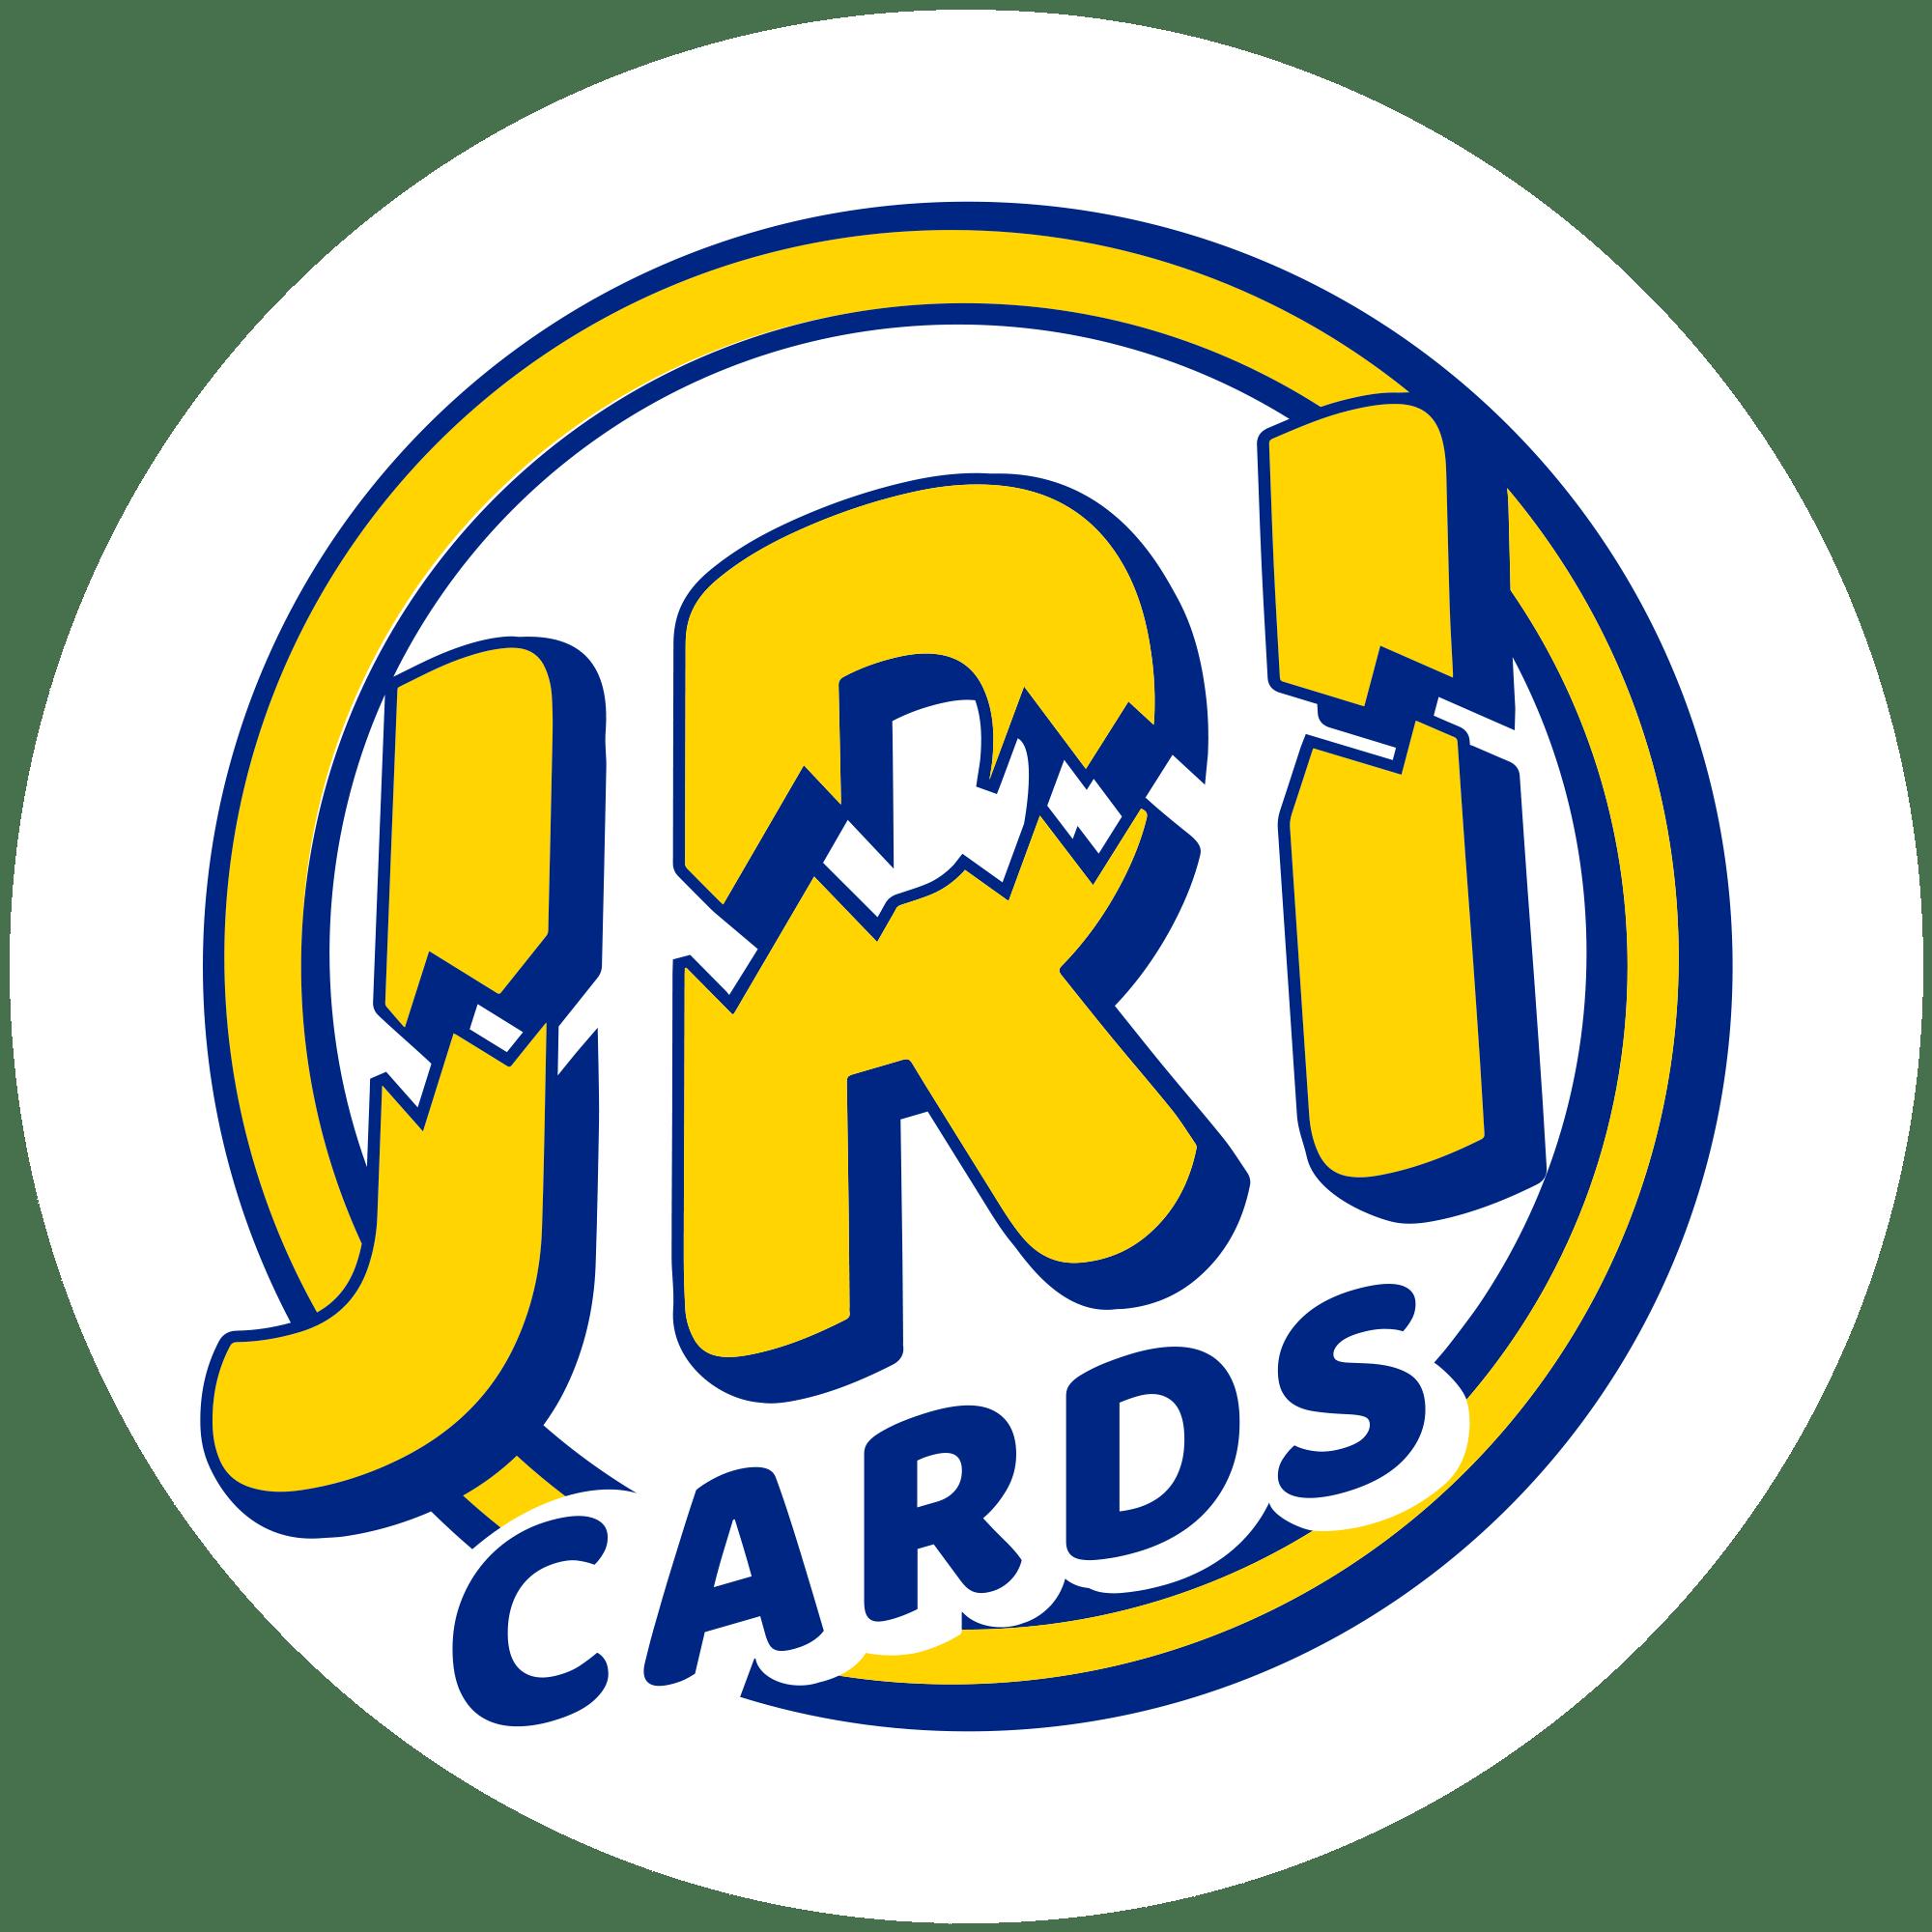 2021 PANINI LEGACY FOOTBALL HOBBY BOX (16 PACKS AVAILABLE)